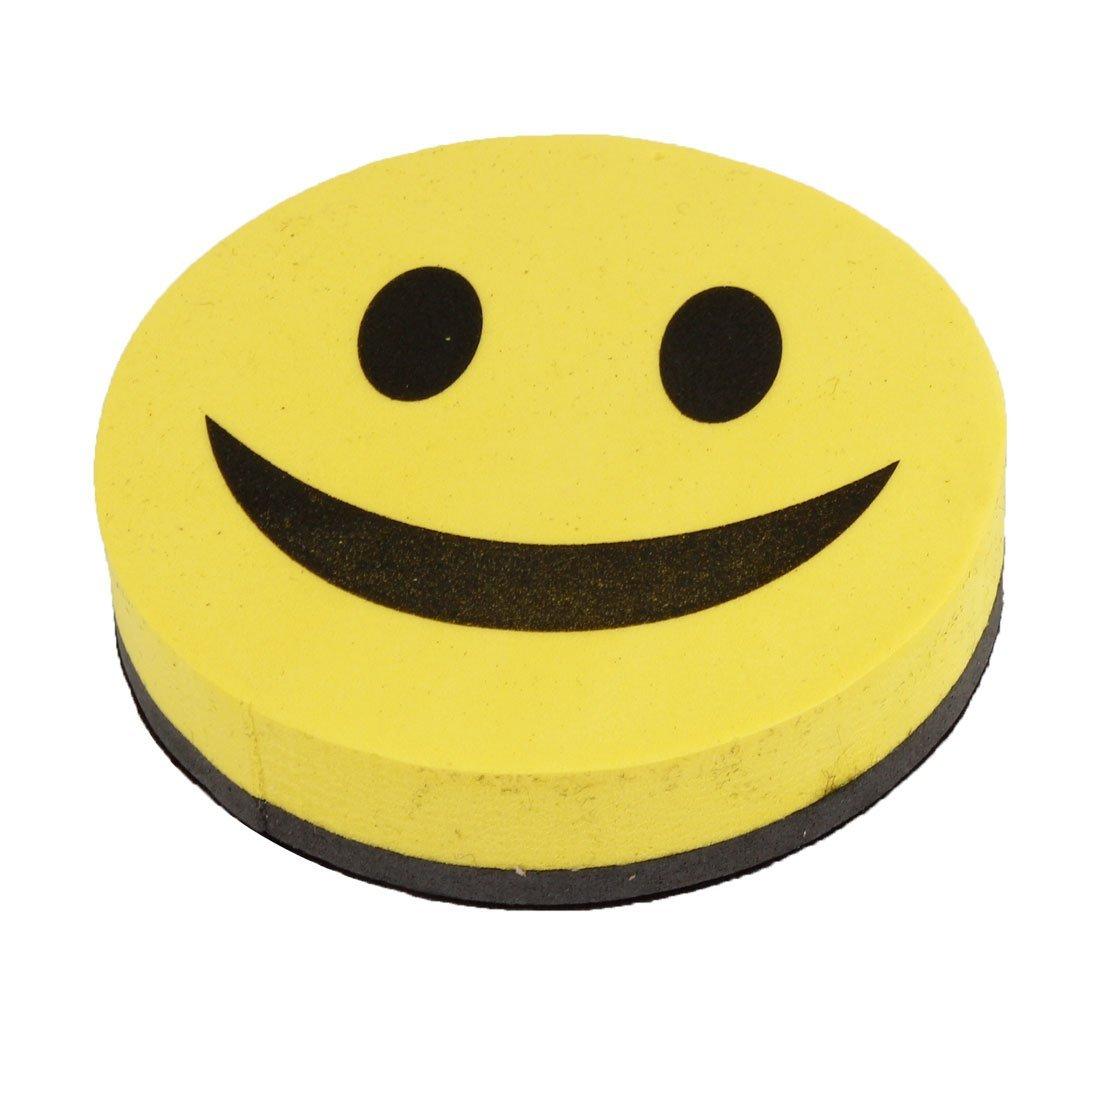 Good Mood Whiteboard Sponge And Slate, Smiley, Magnetic, Yellow And Black